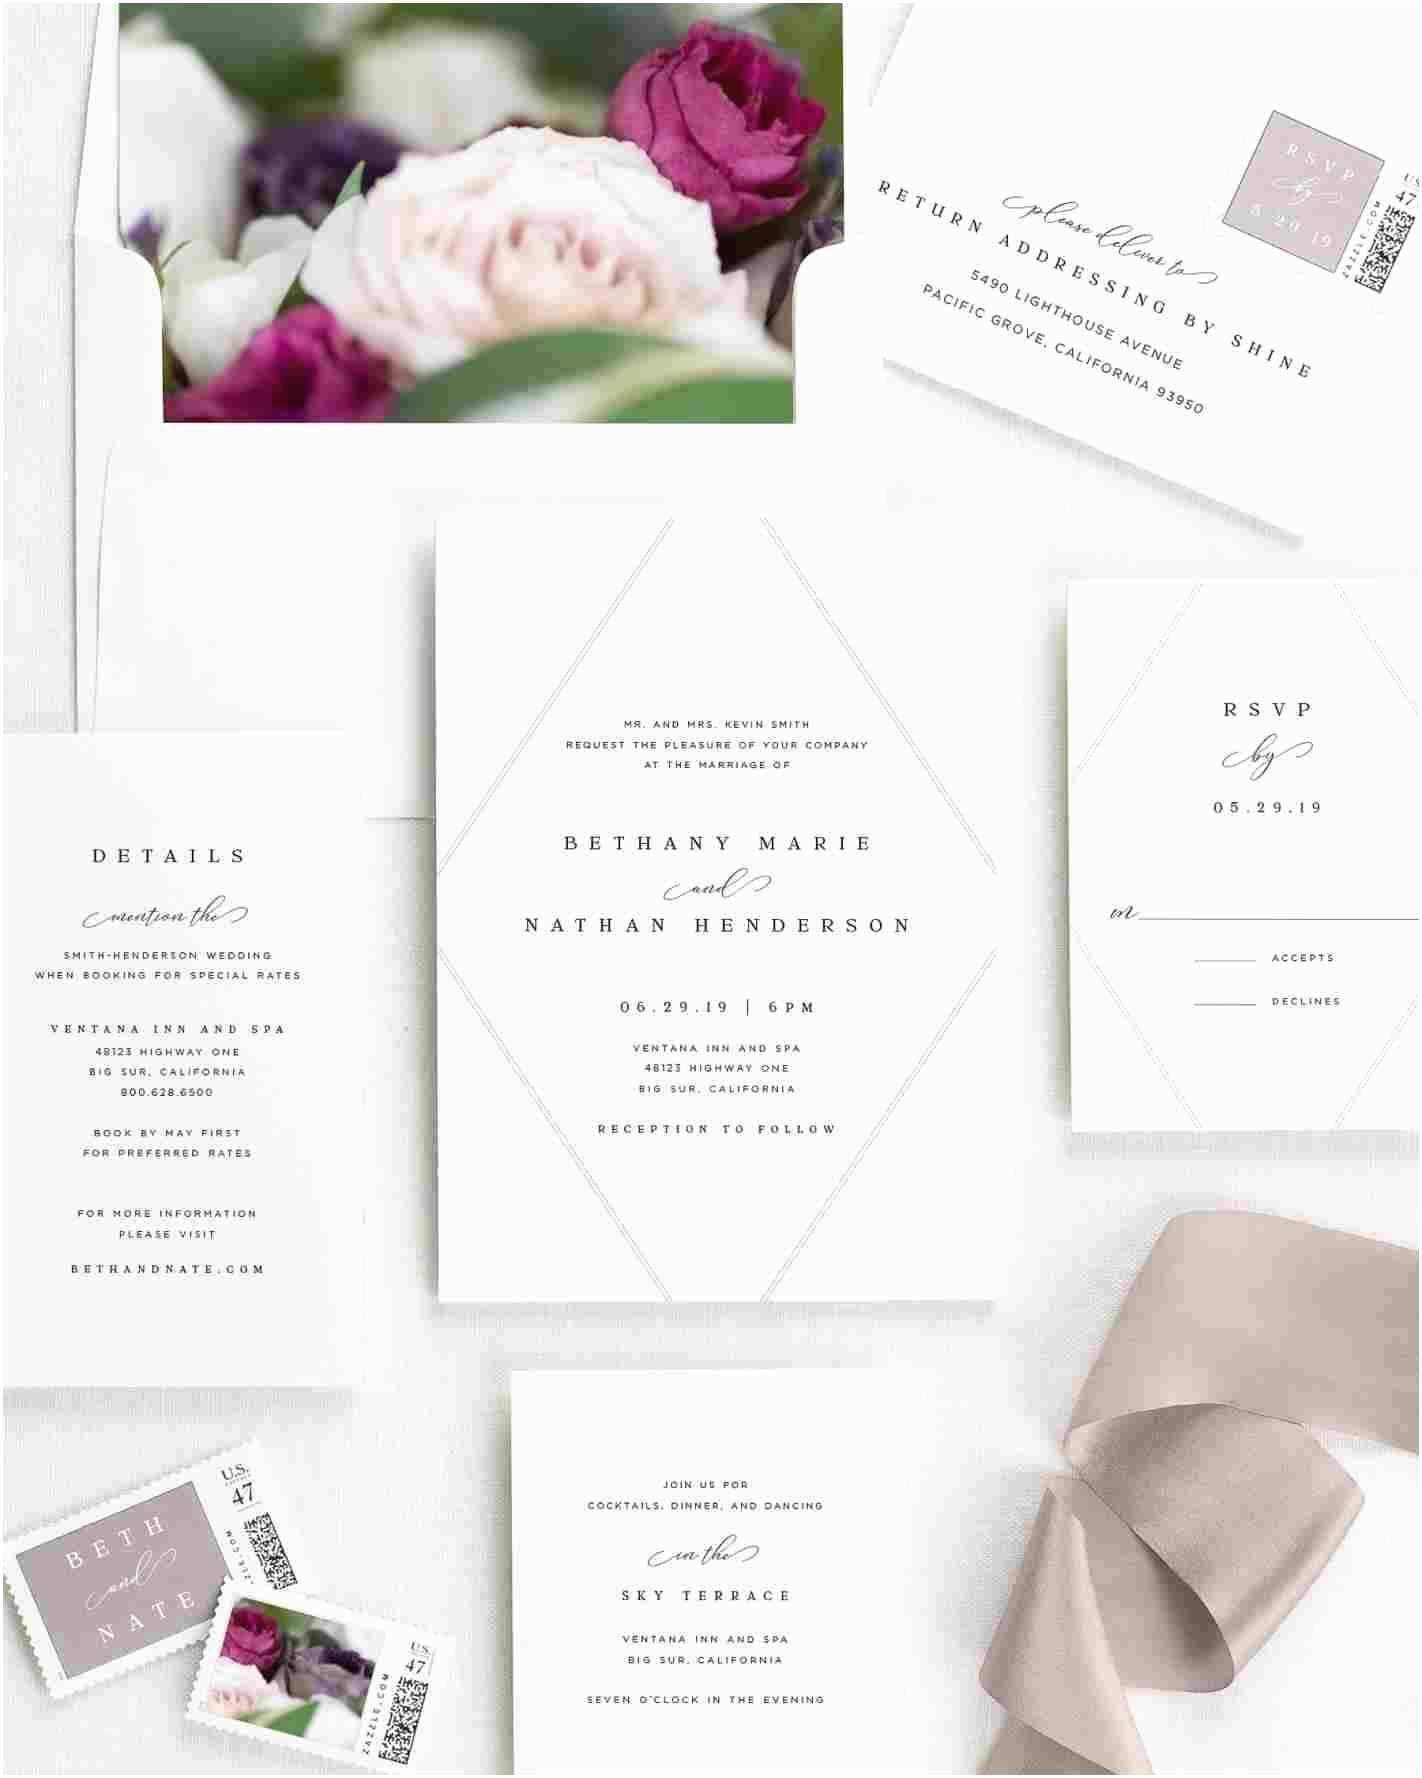 Joann Fabrics Wedding Invitations Modern Marvel Wedding Invitations that Will Make You Happy